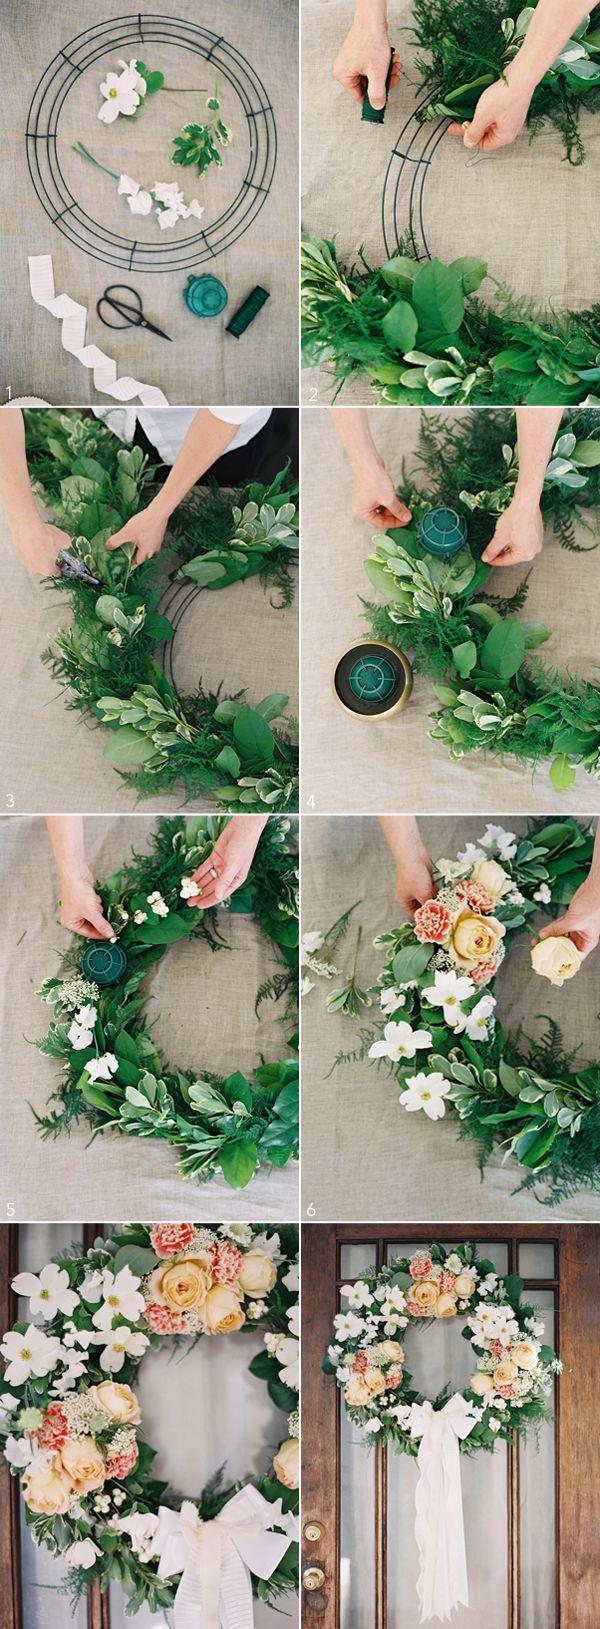 34 best diy wedding ideas images on pinterest backyard weddings diy wedding wreath from rosegolden flowers junglespirit Image collections